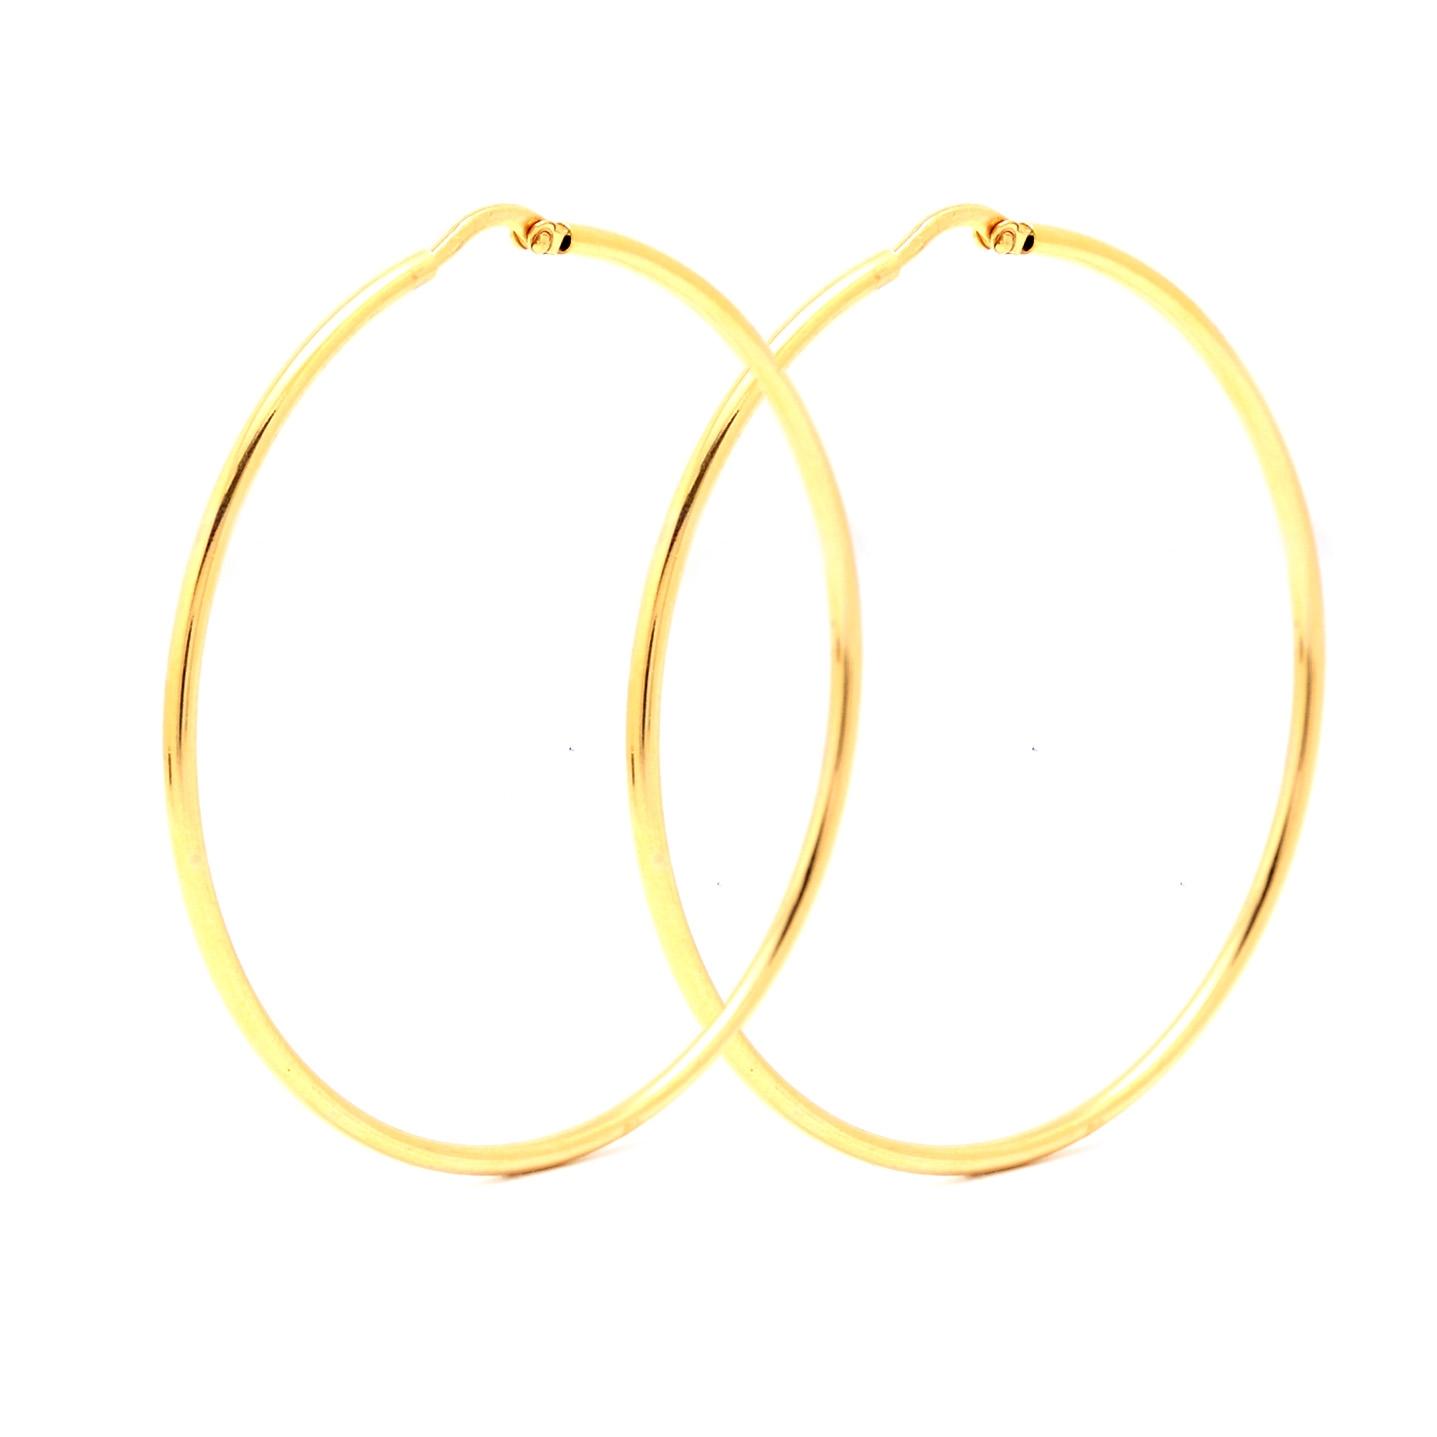 Zlaté náušnice CALEY - veľké kruhy